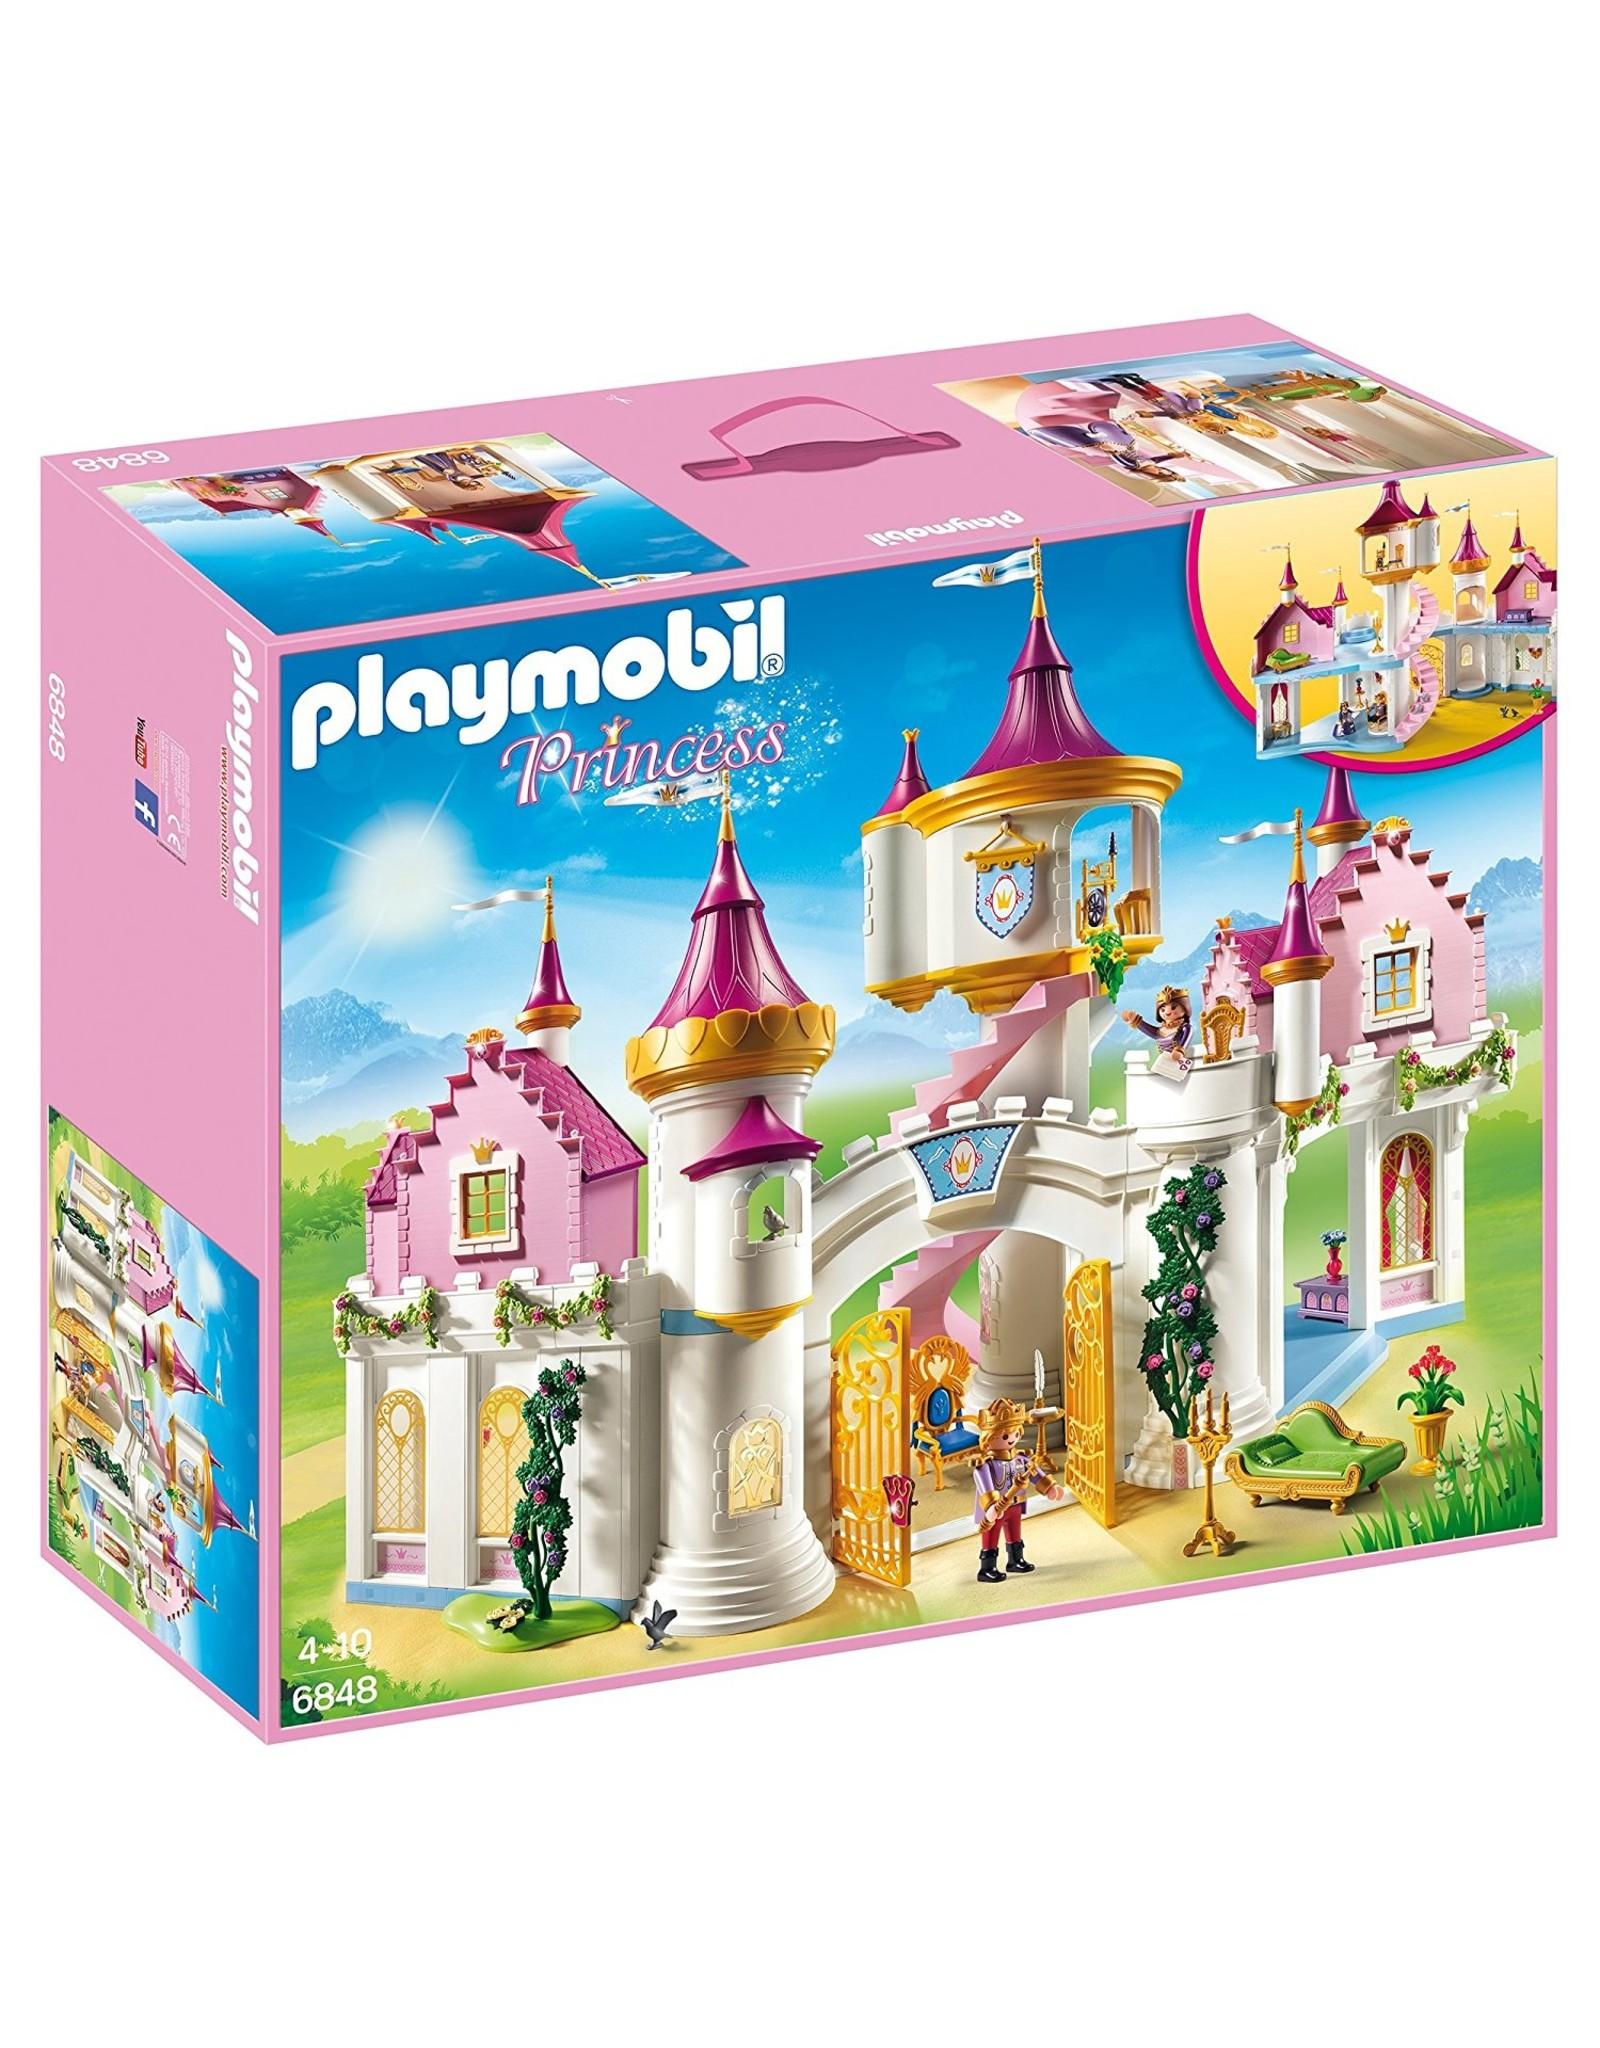 Playmobil Princess  Grand Princess Castle 6848